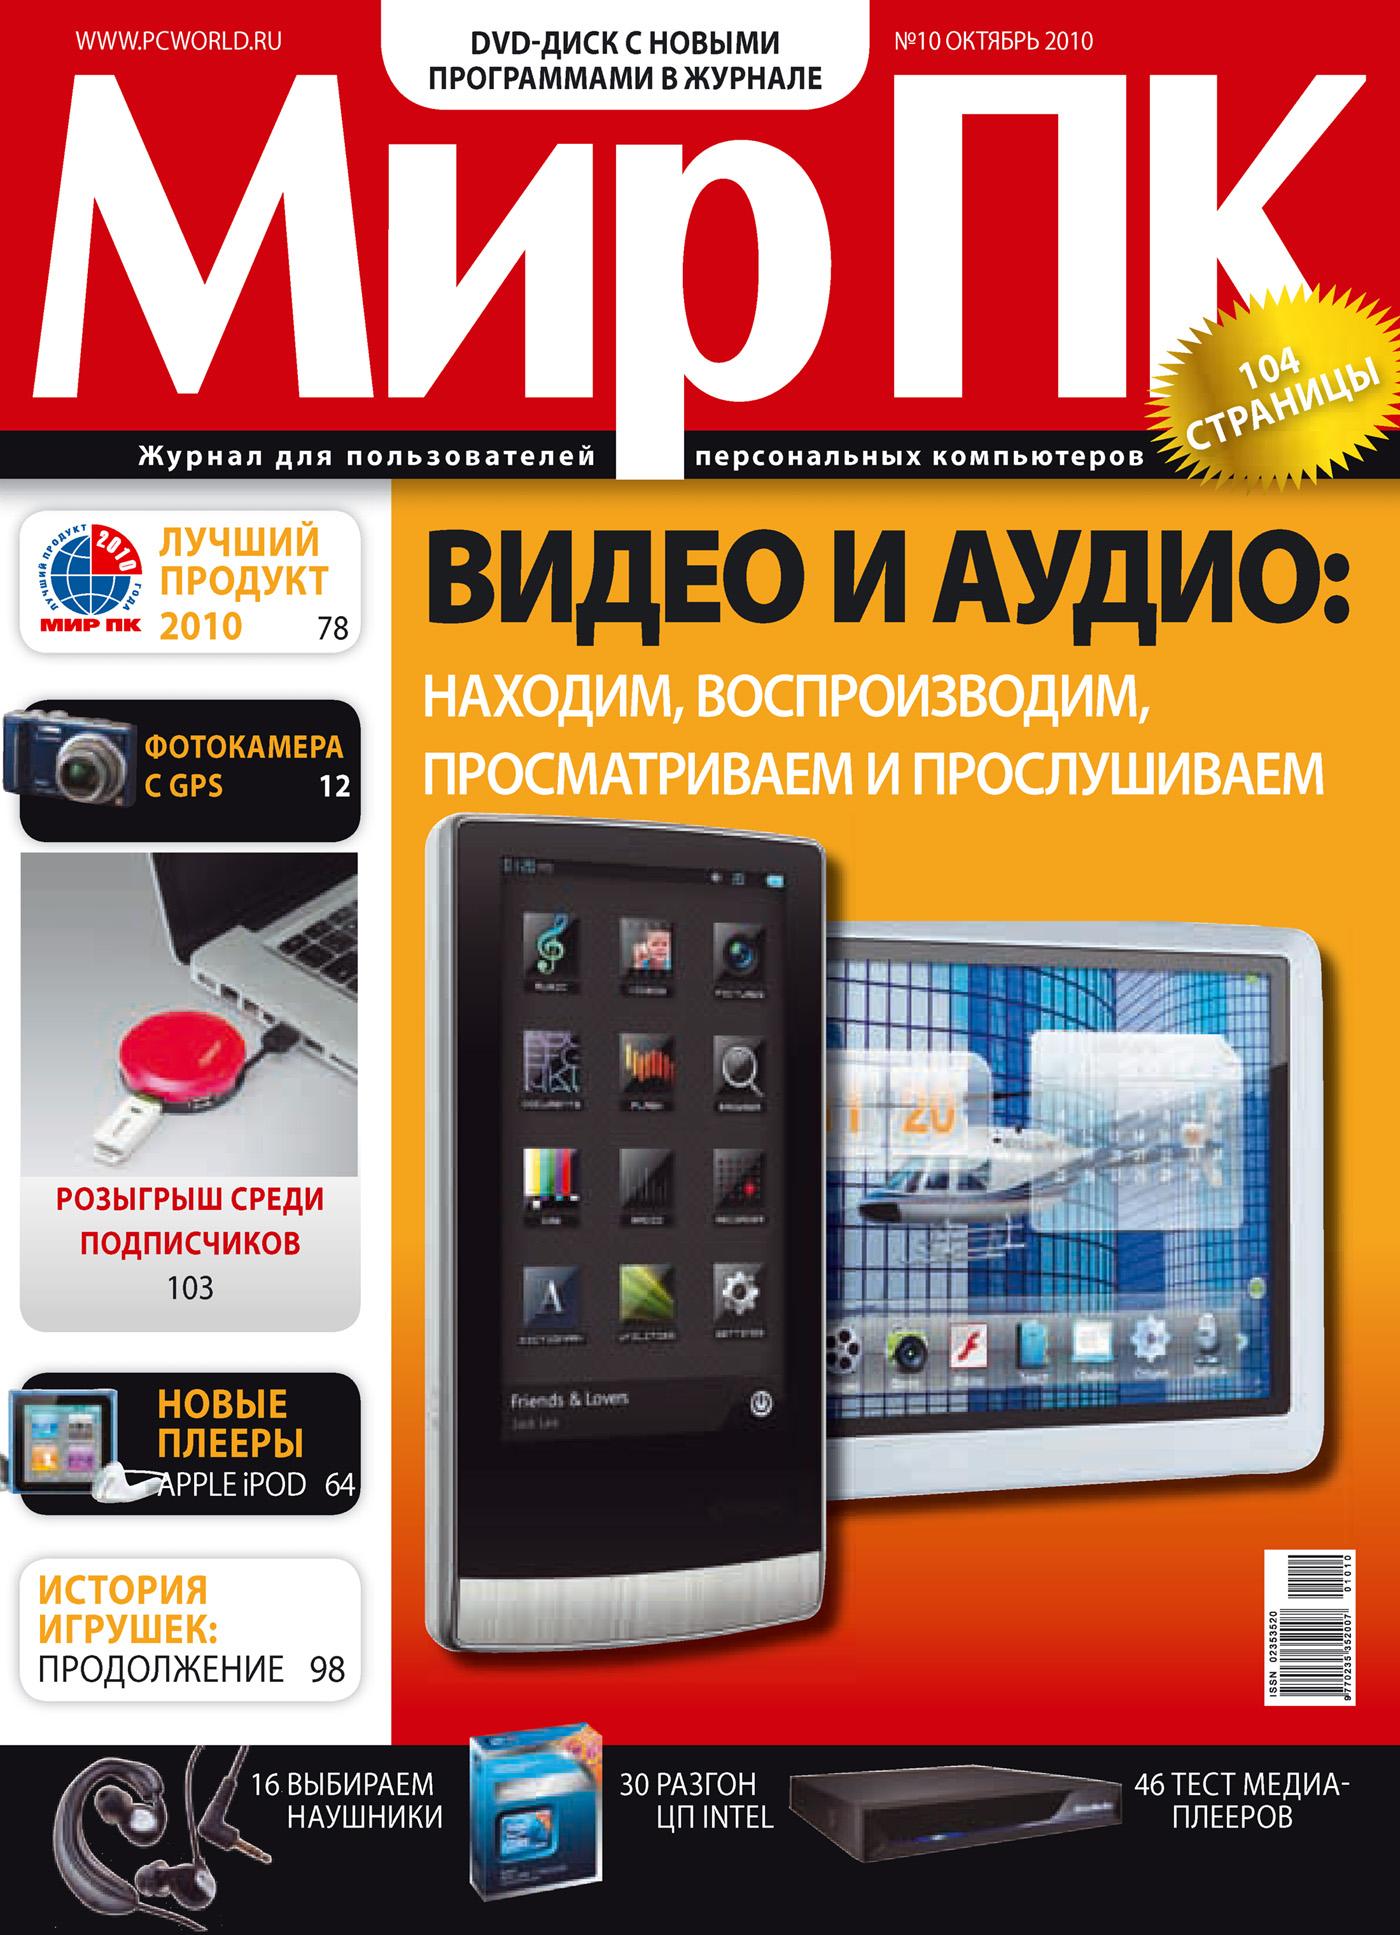 Журнал «Мир ПК» № 10/2010